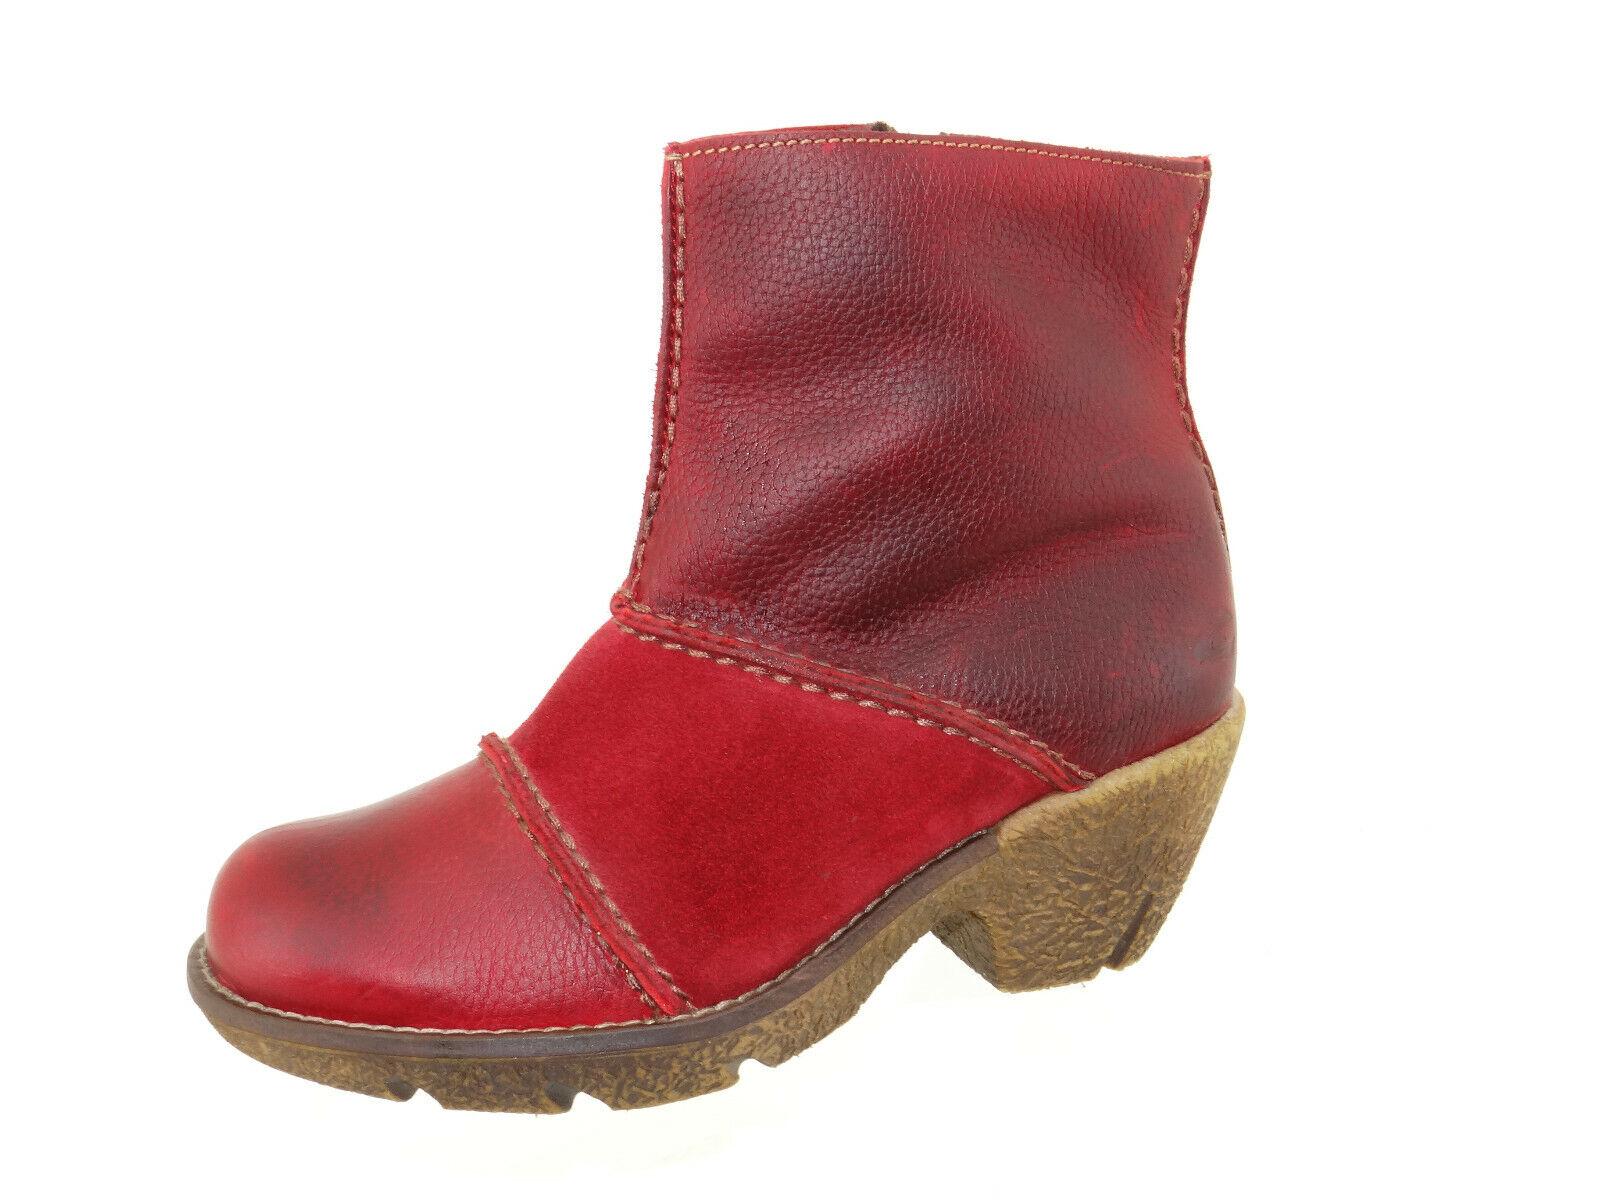 Aktiv Schuhe Lotus 6 39 Gr Camel Rot Stiefel OkZuiXP